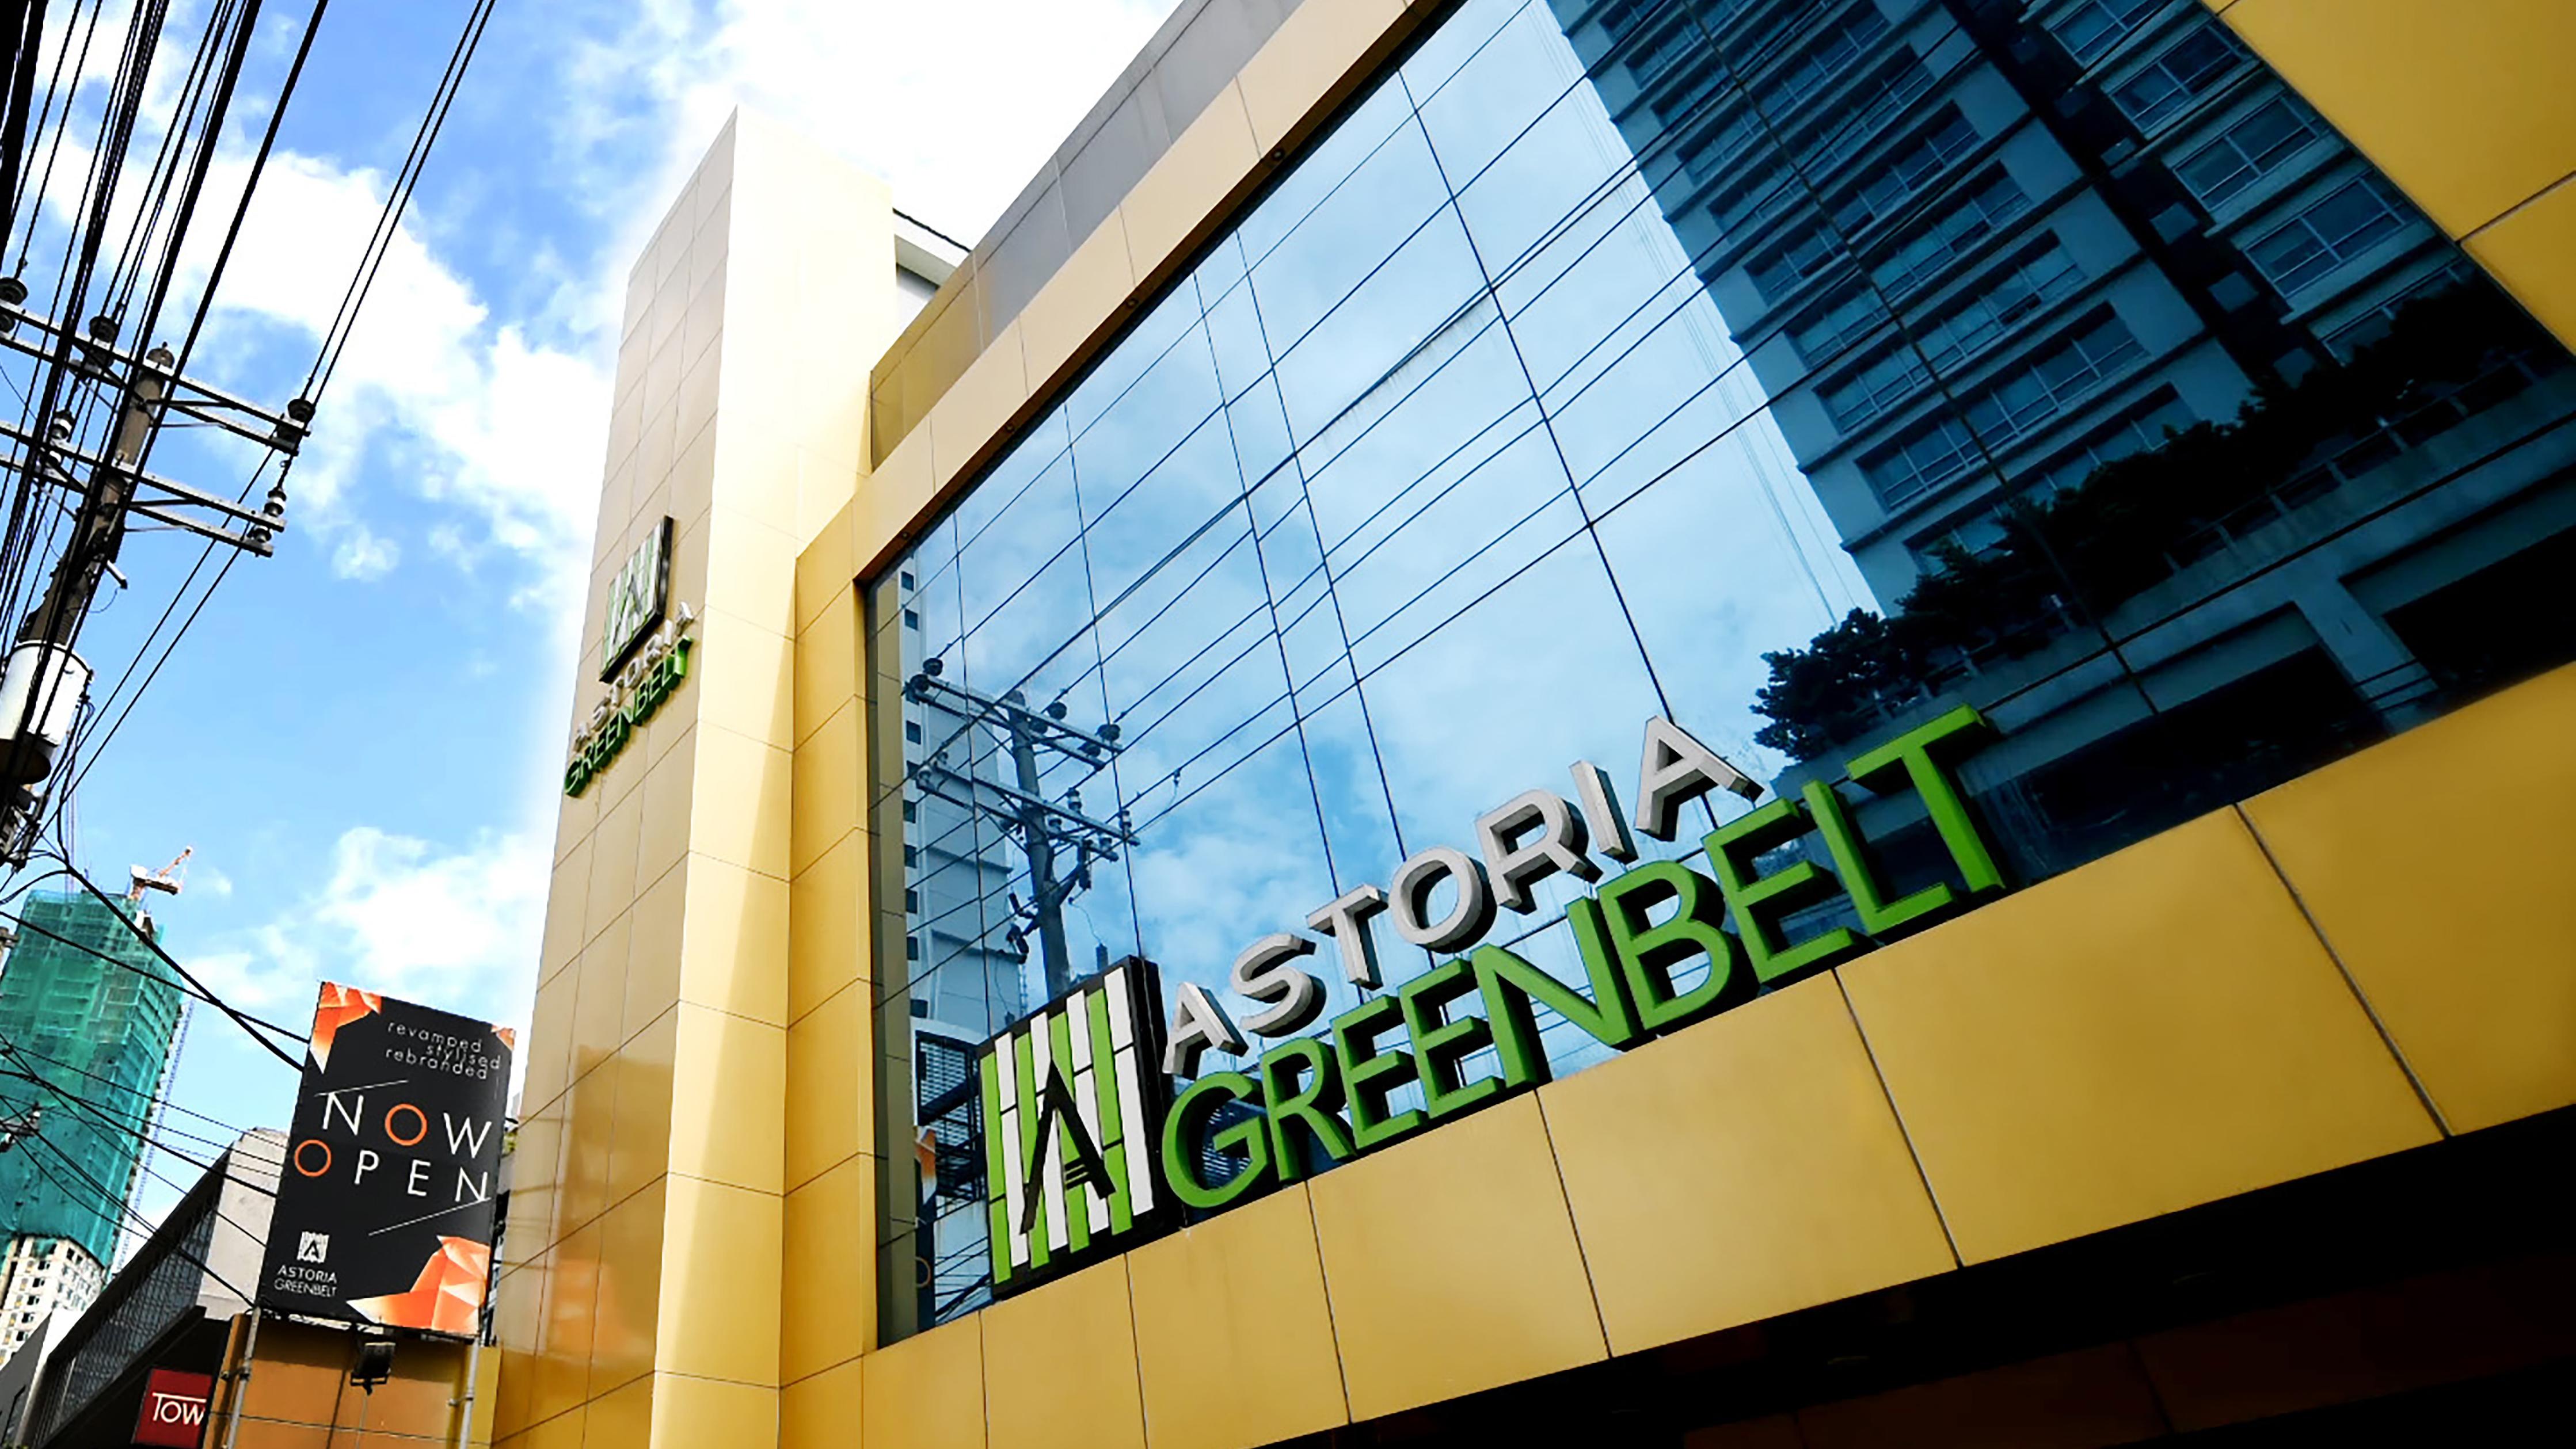 Facade of Astoria Greenbelt in Makati